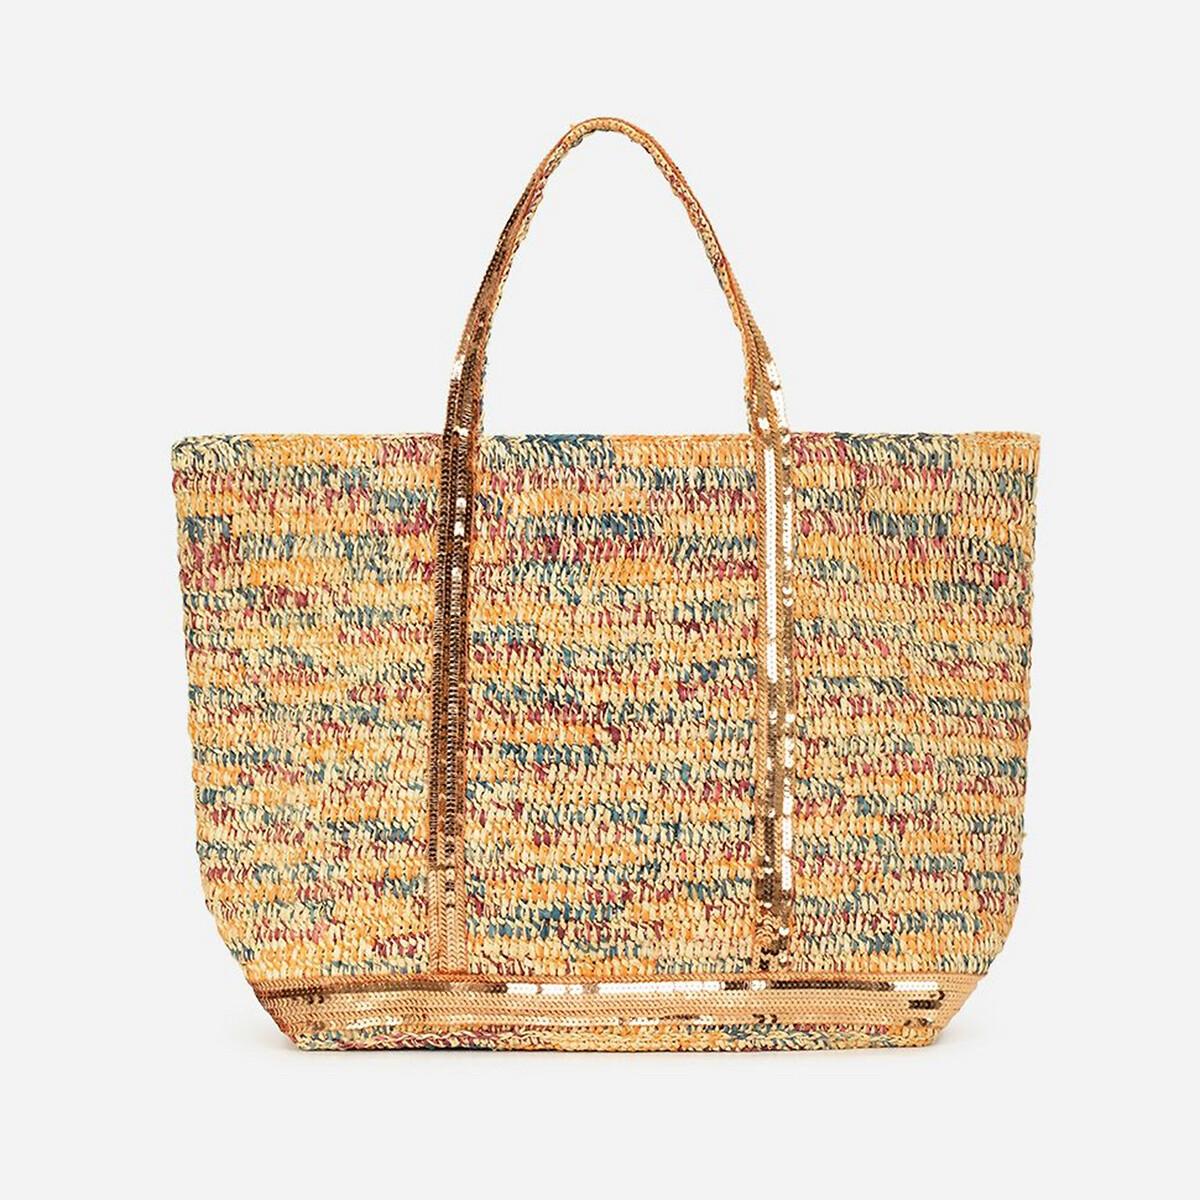 Фото - Сумка-шоппер La Redoute Средняя из рафии и пайеток единый размер разноцветный сумка шоппер средняя из парусины с блестками